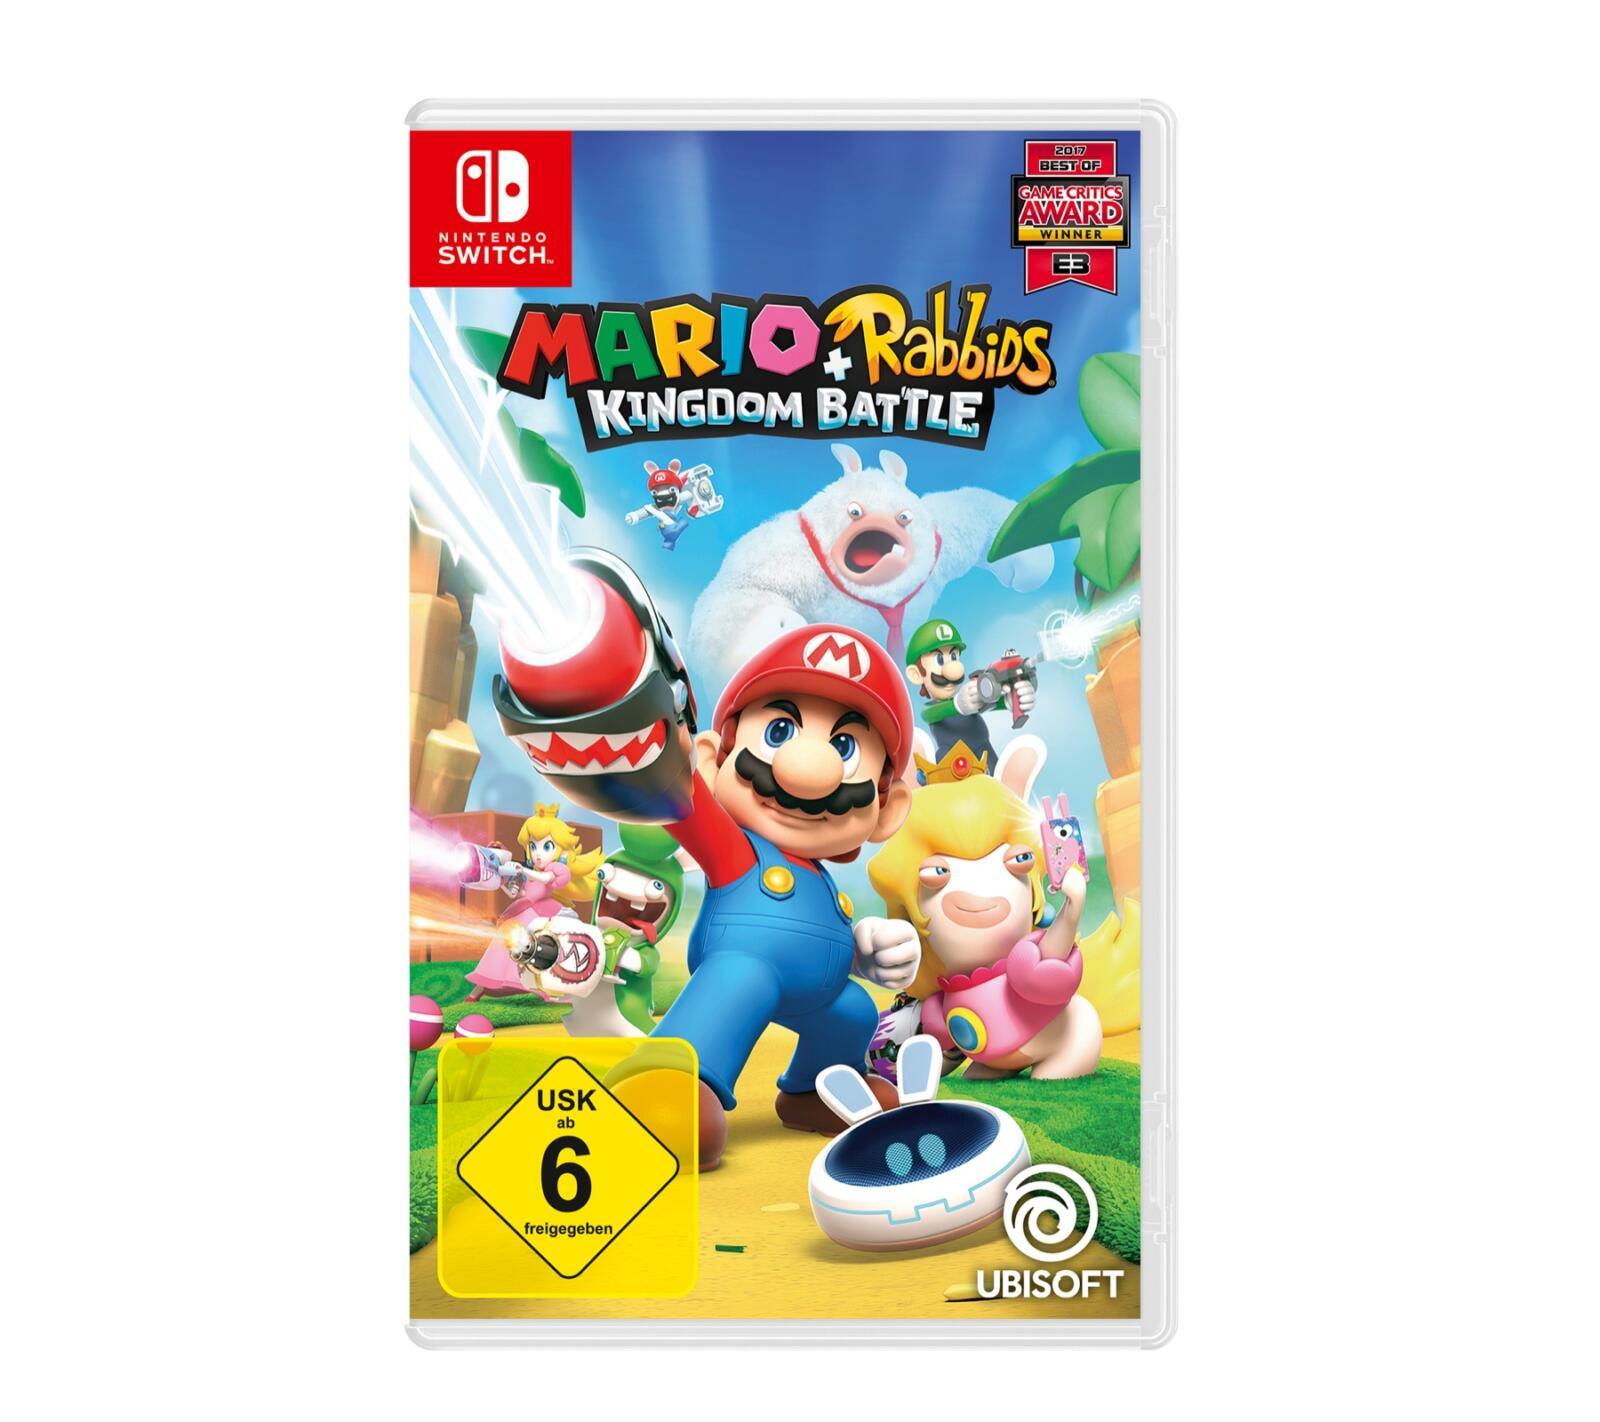 aff kingdom battle mario Nintendo rabbids Switch ubisoft